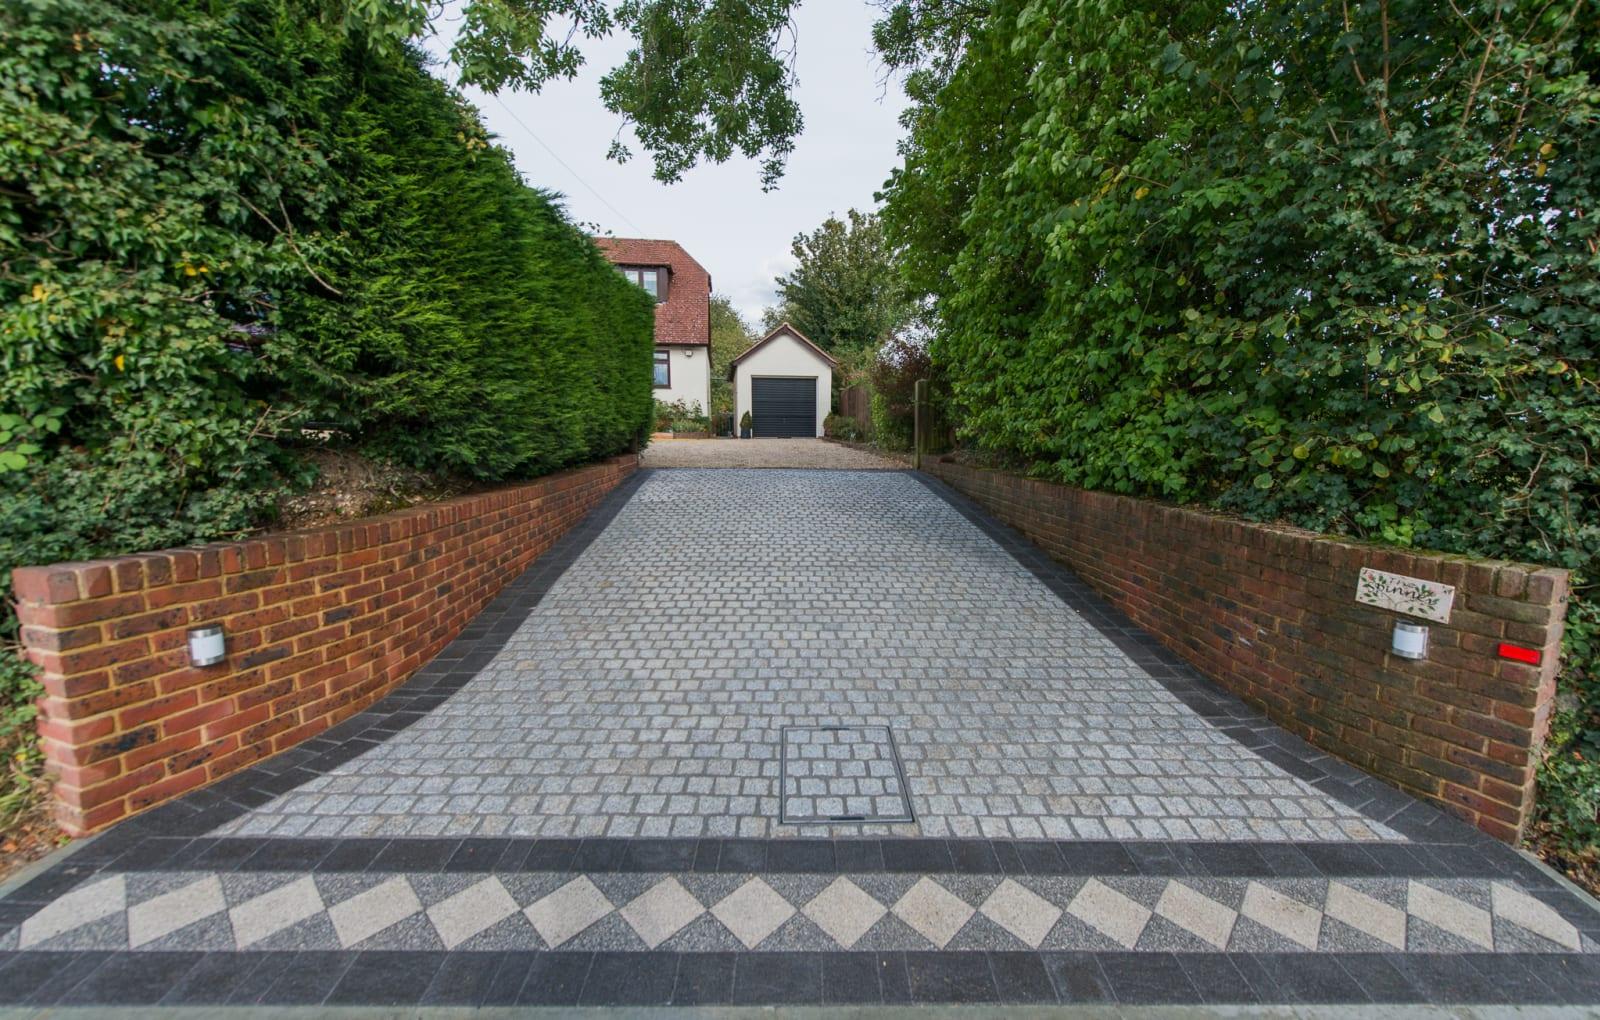 Marshalls Sawn Granite Setts and Drivesett Argent in Light and Dark block paving